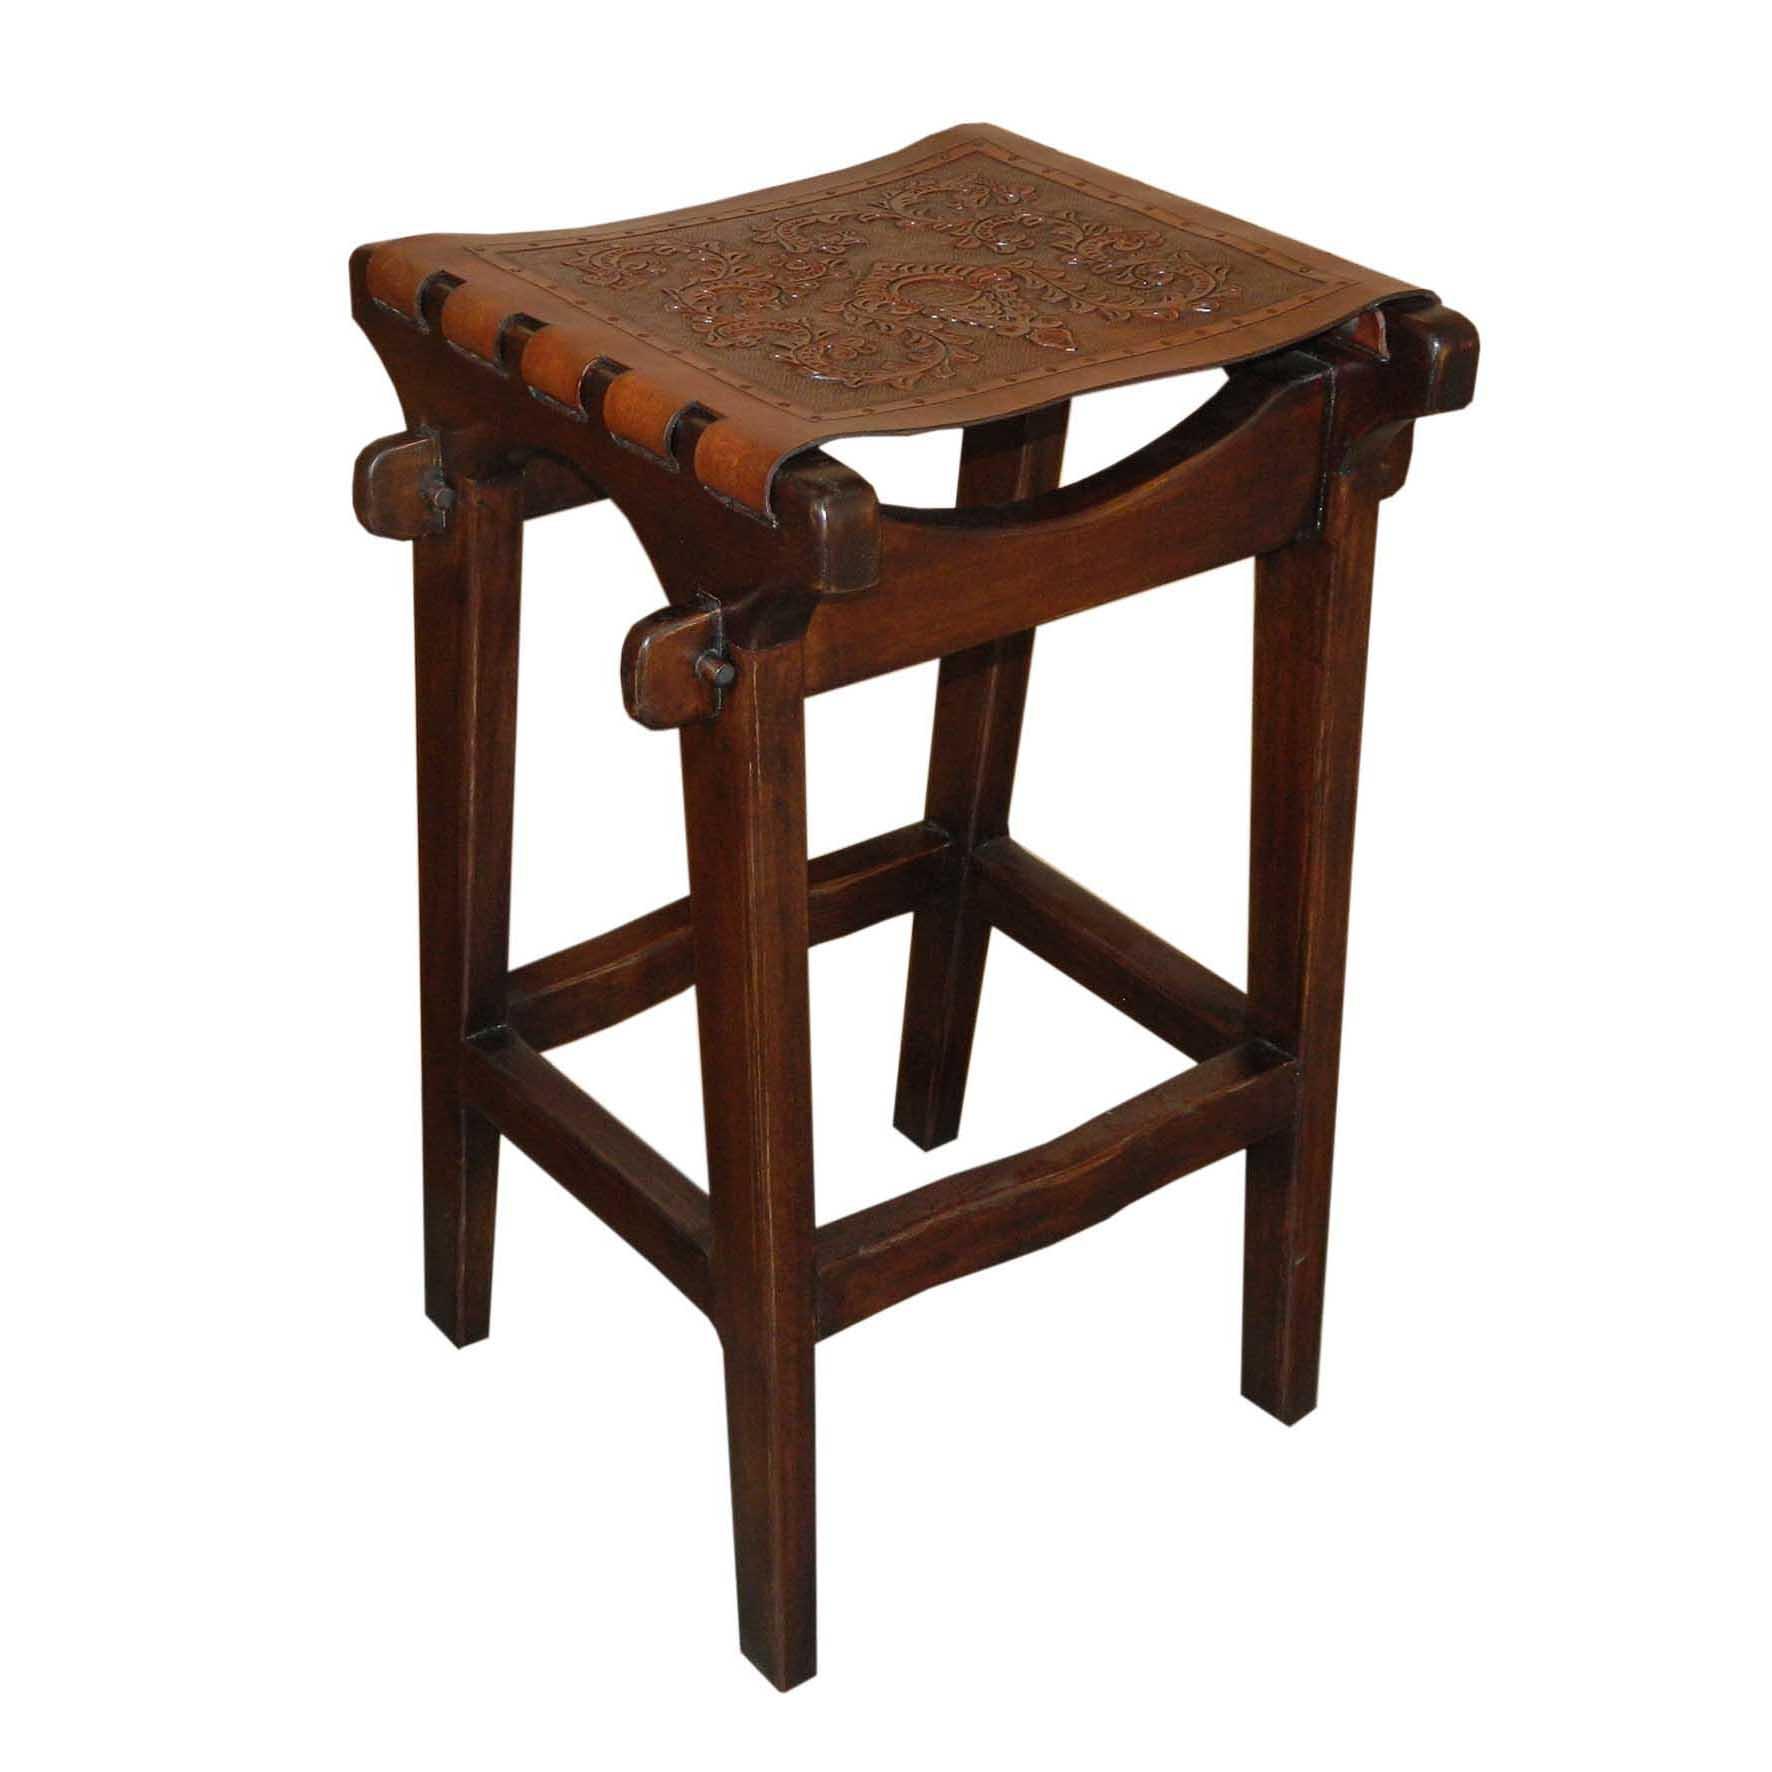 Bar Stools And Chairs Llc Custom Wood Bar Stools Hand